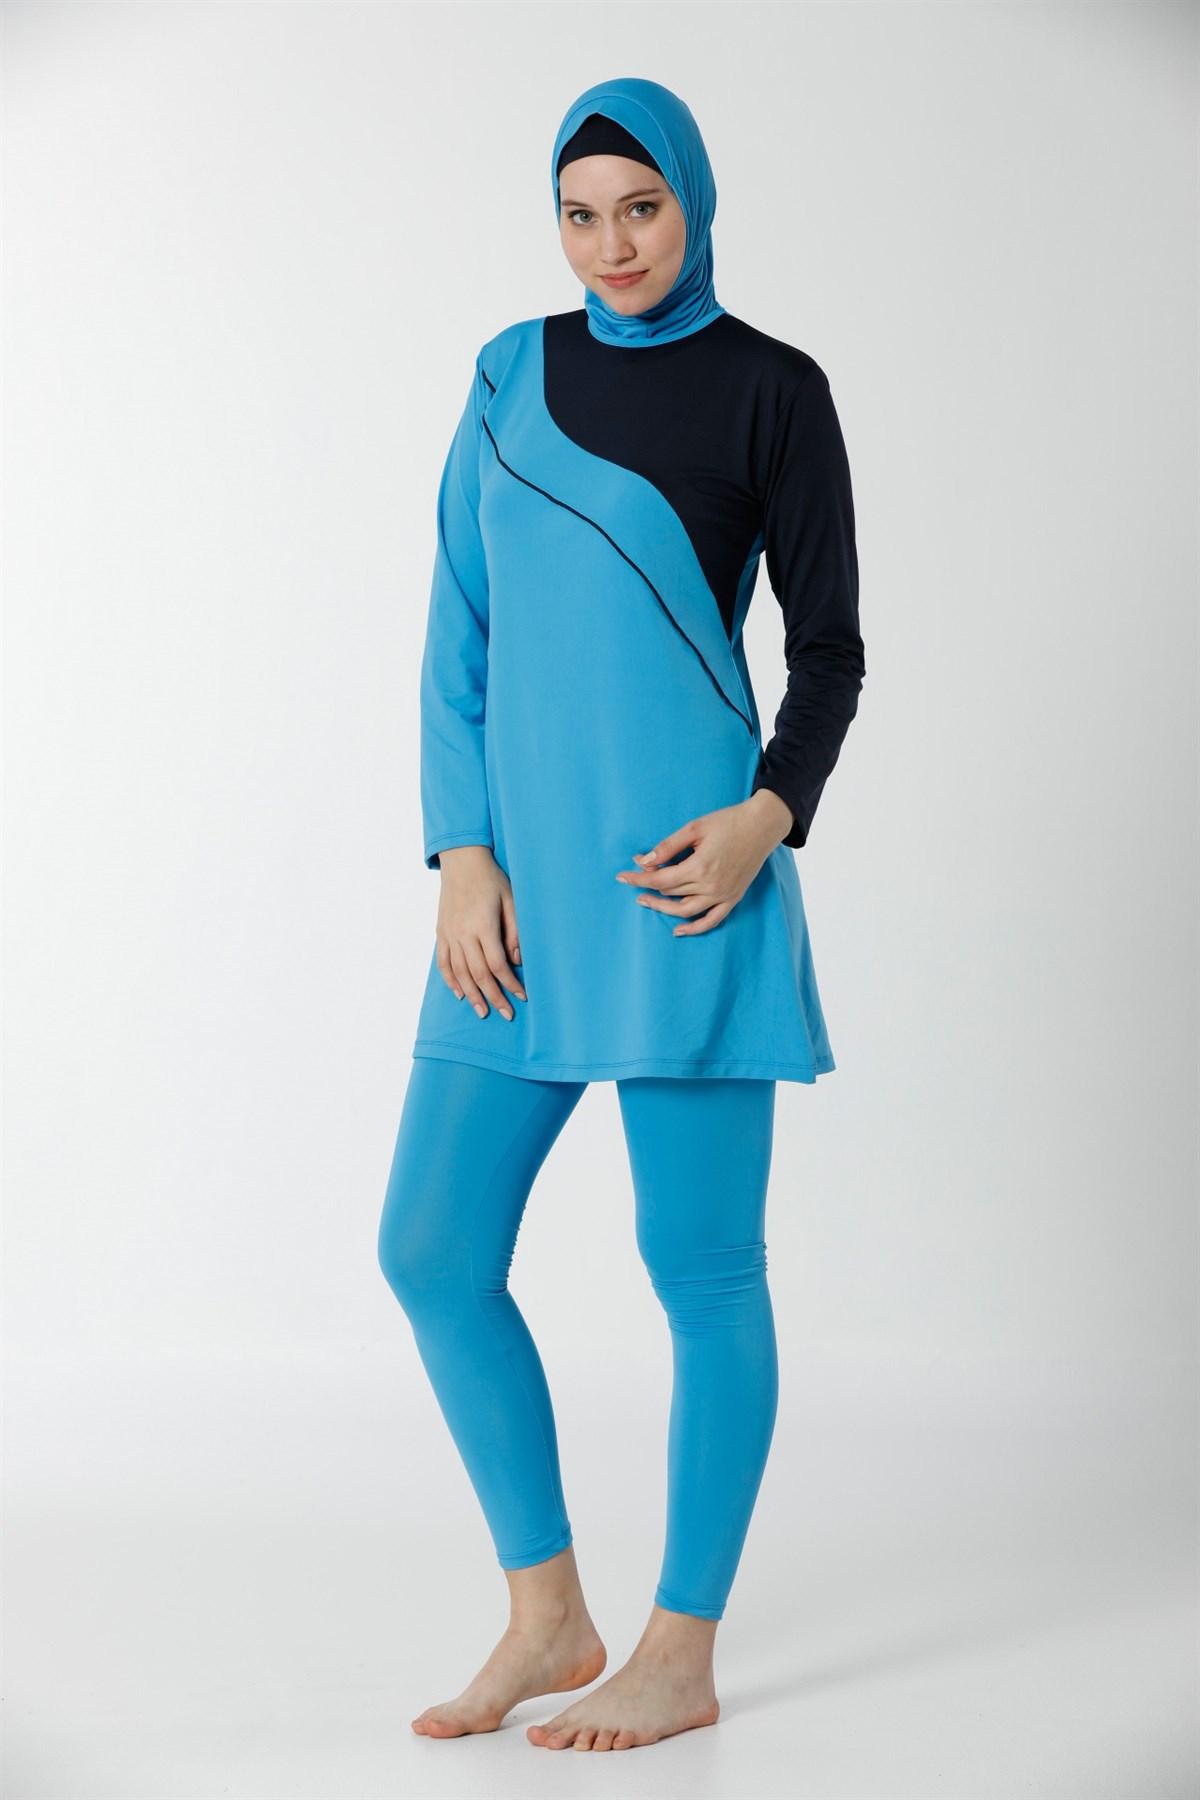 Moda Çizgi Tam Kapalı Taytlı Likralı Tesettür Mayo 28106